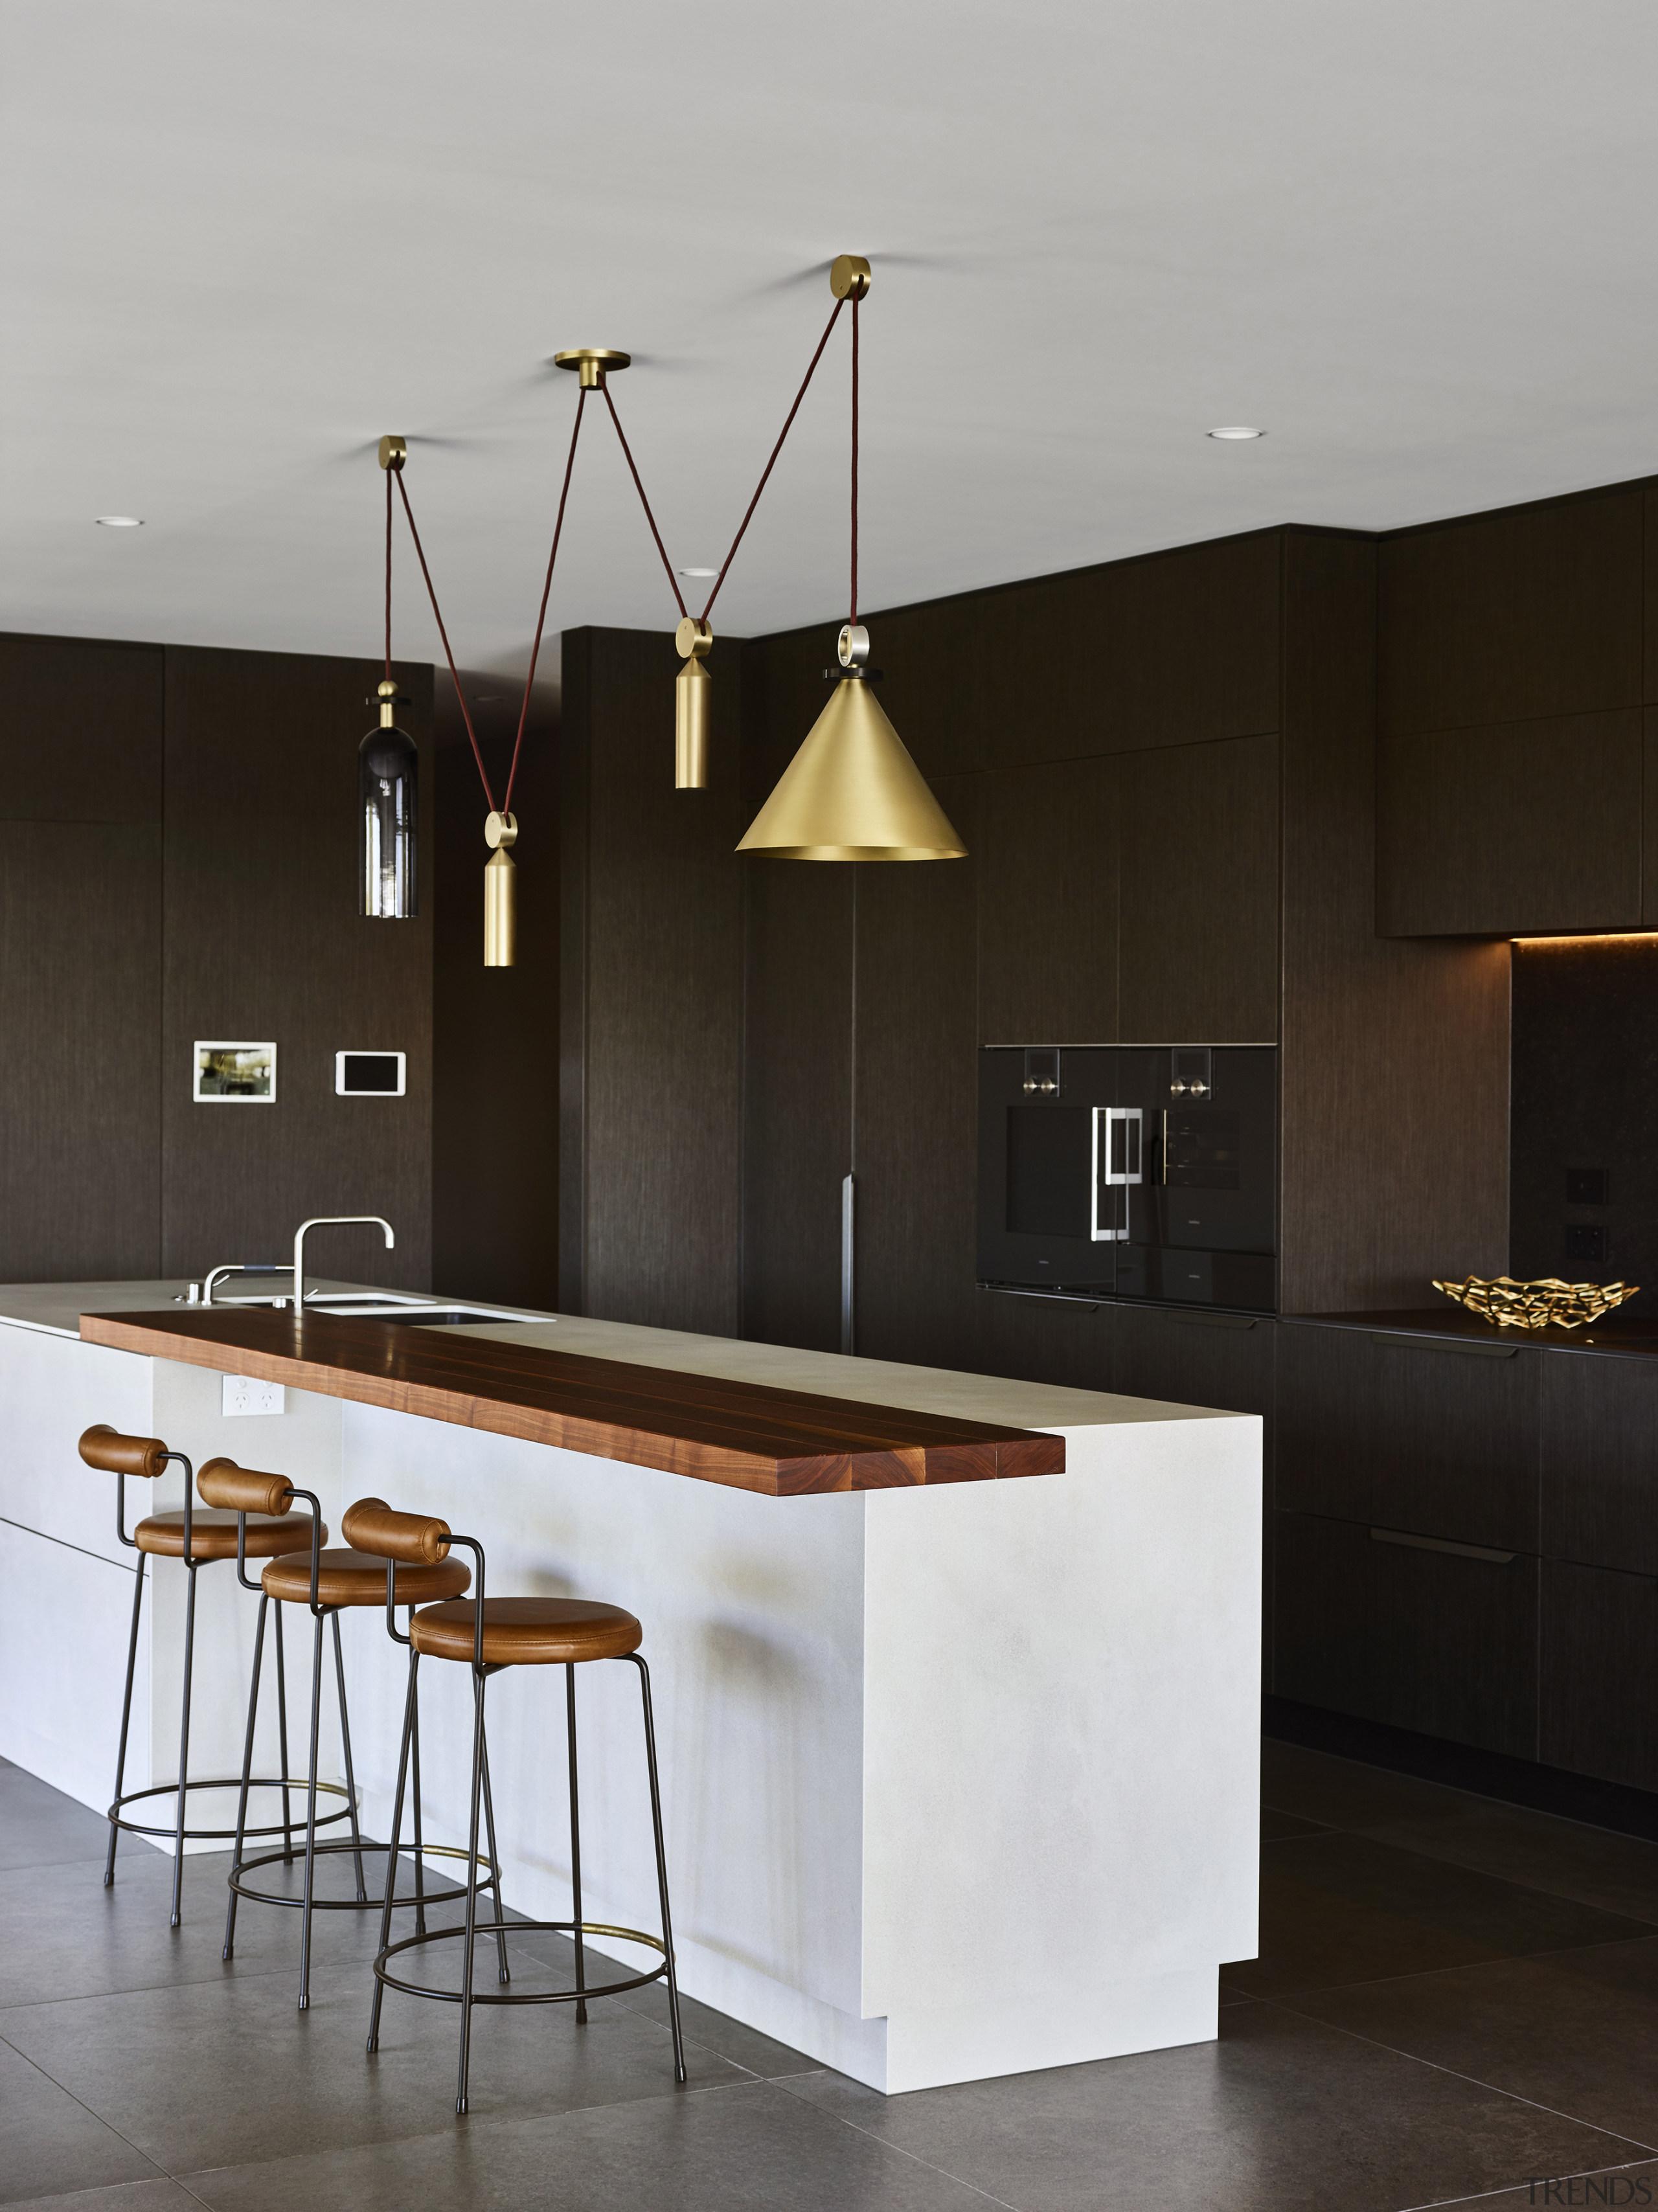 Apt companions – a counter-weighted lighting fixture shines architecture, bar stool, countertop, design, furniture, kitchen, light fixture, lighting, Darren James, Brass Lighting